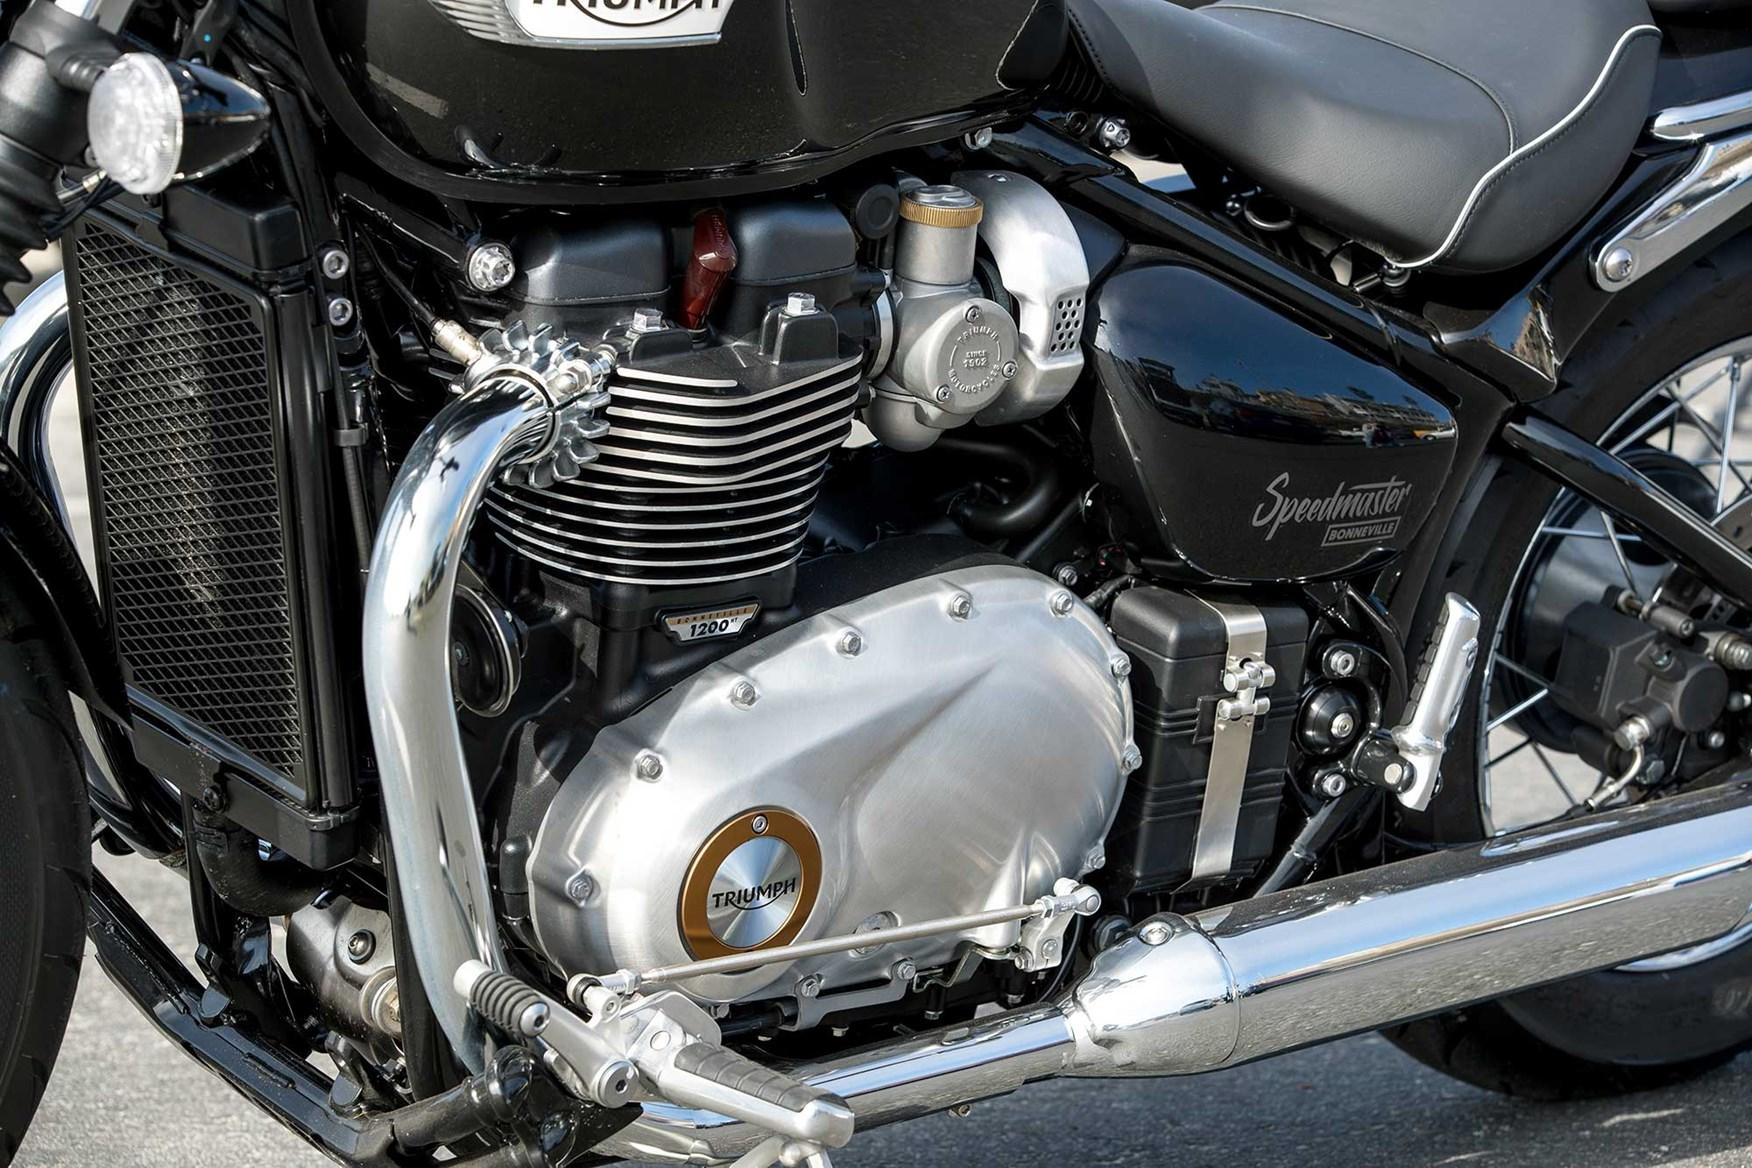 First Ride Triumphs Bonneville Speedmaster Custom Desirable